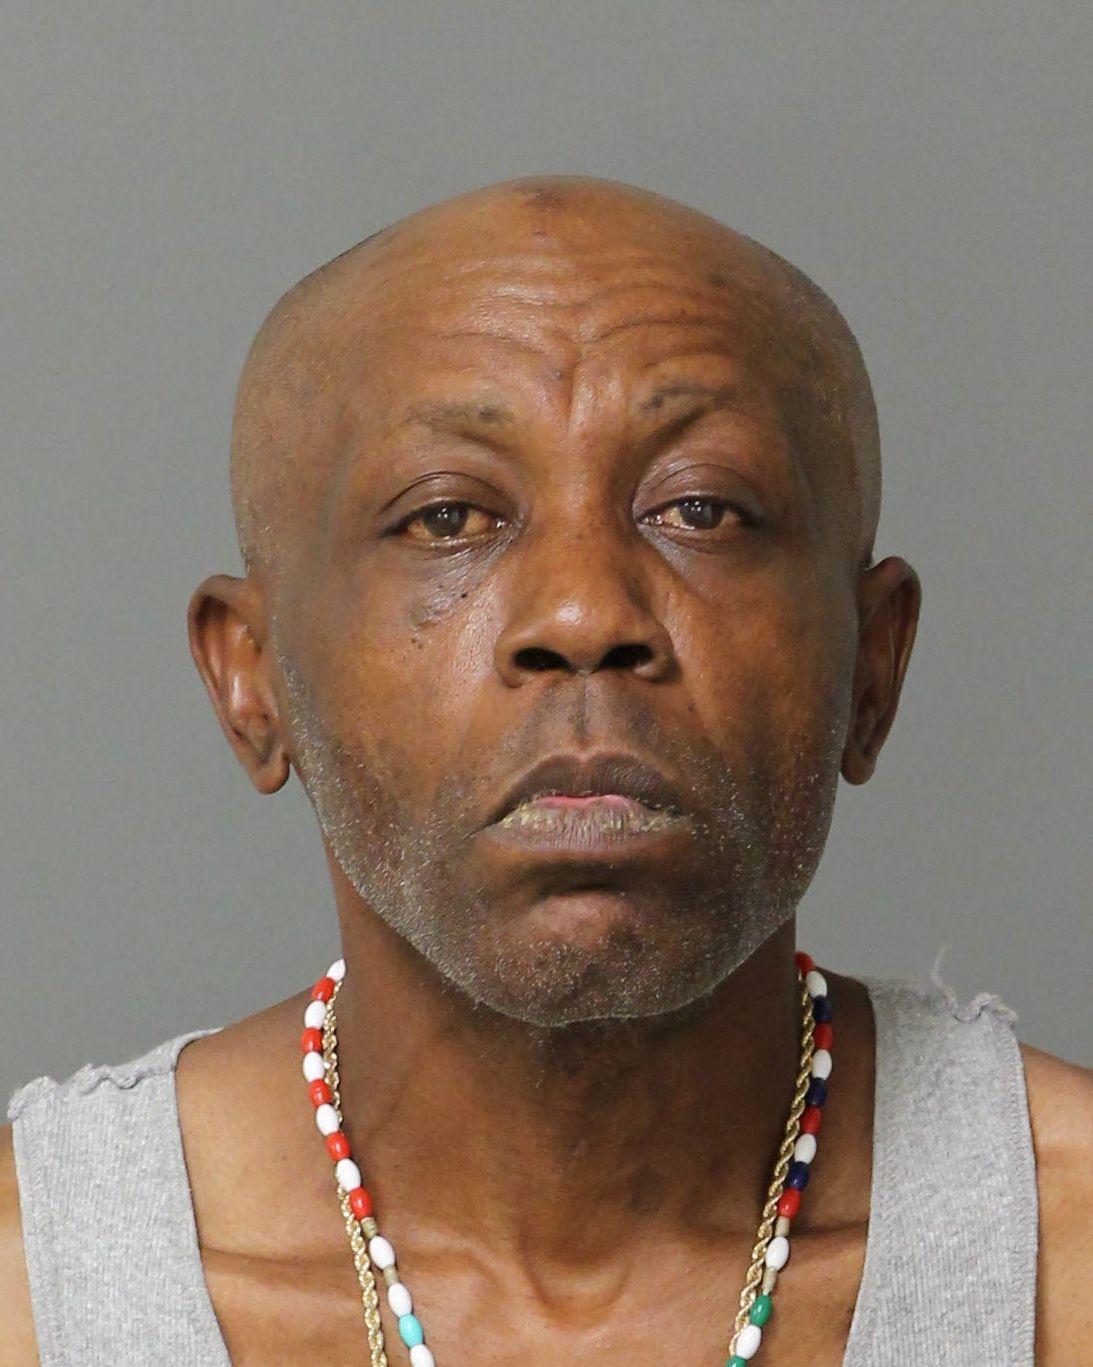 TRAVIS MYRON HINTON Mugshot / County Arrests / Wake County Arrests